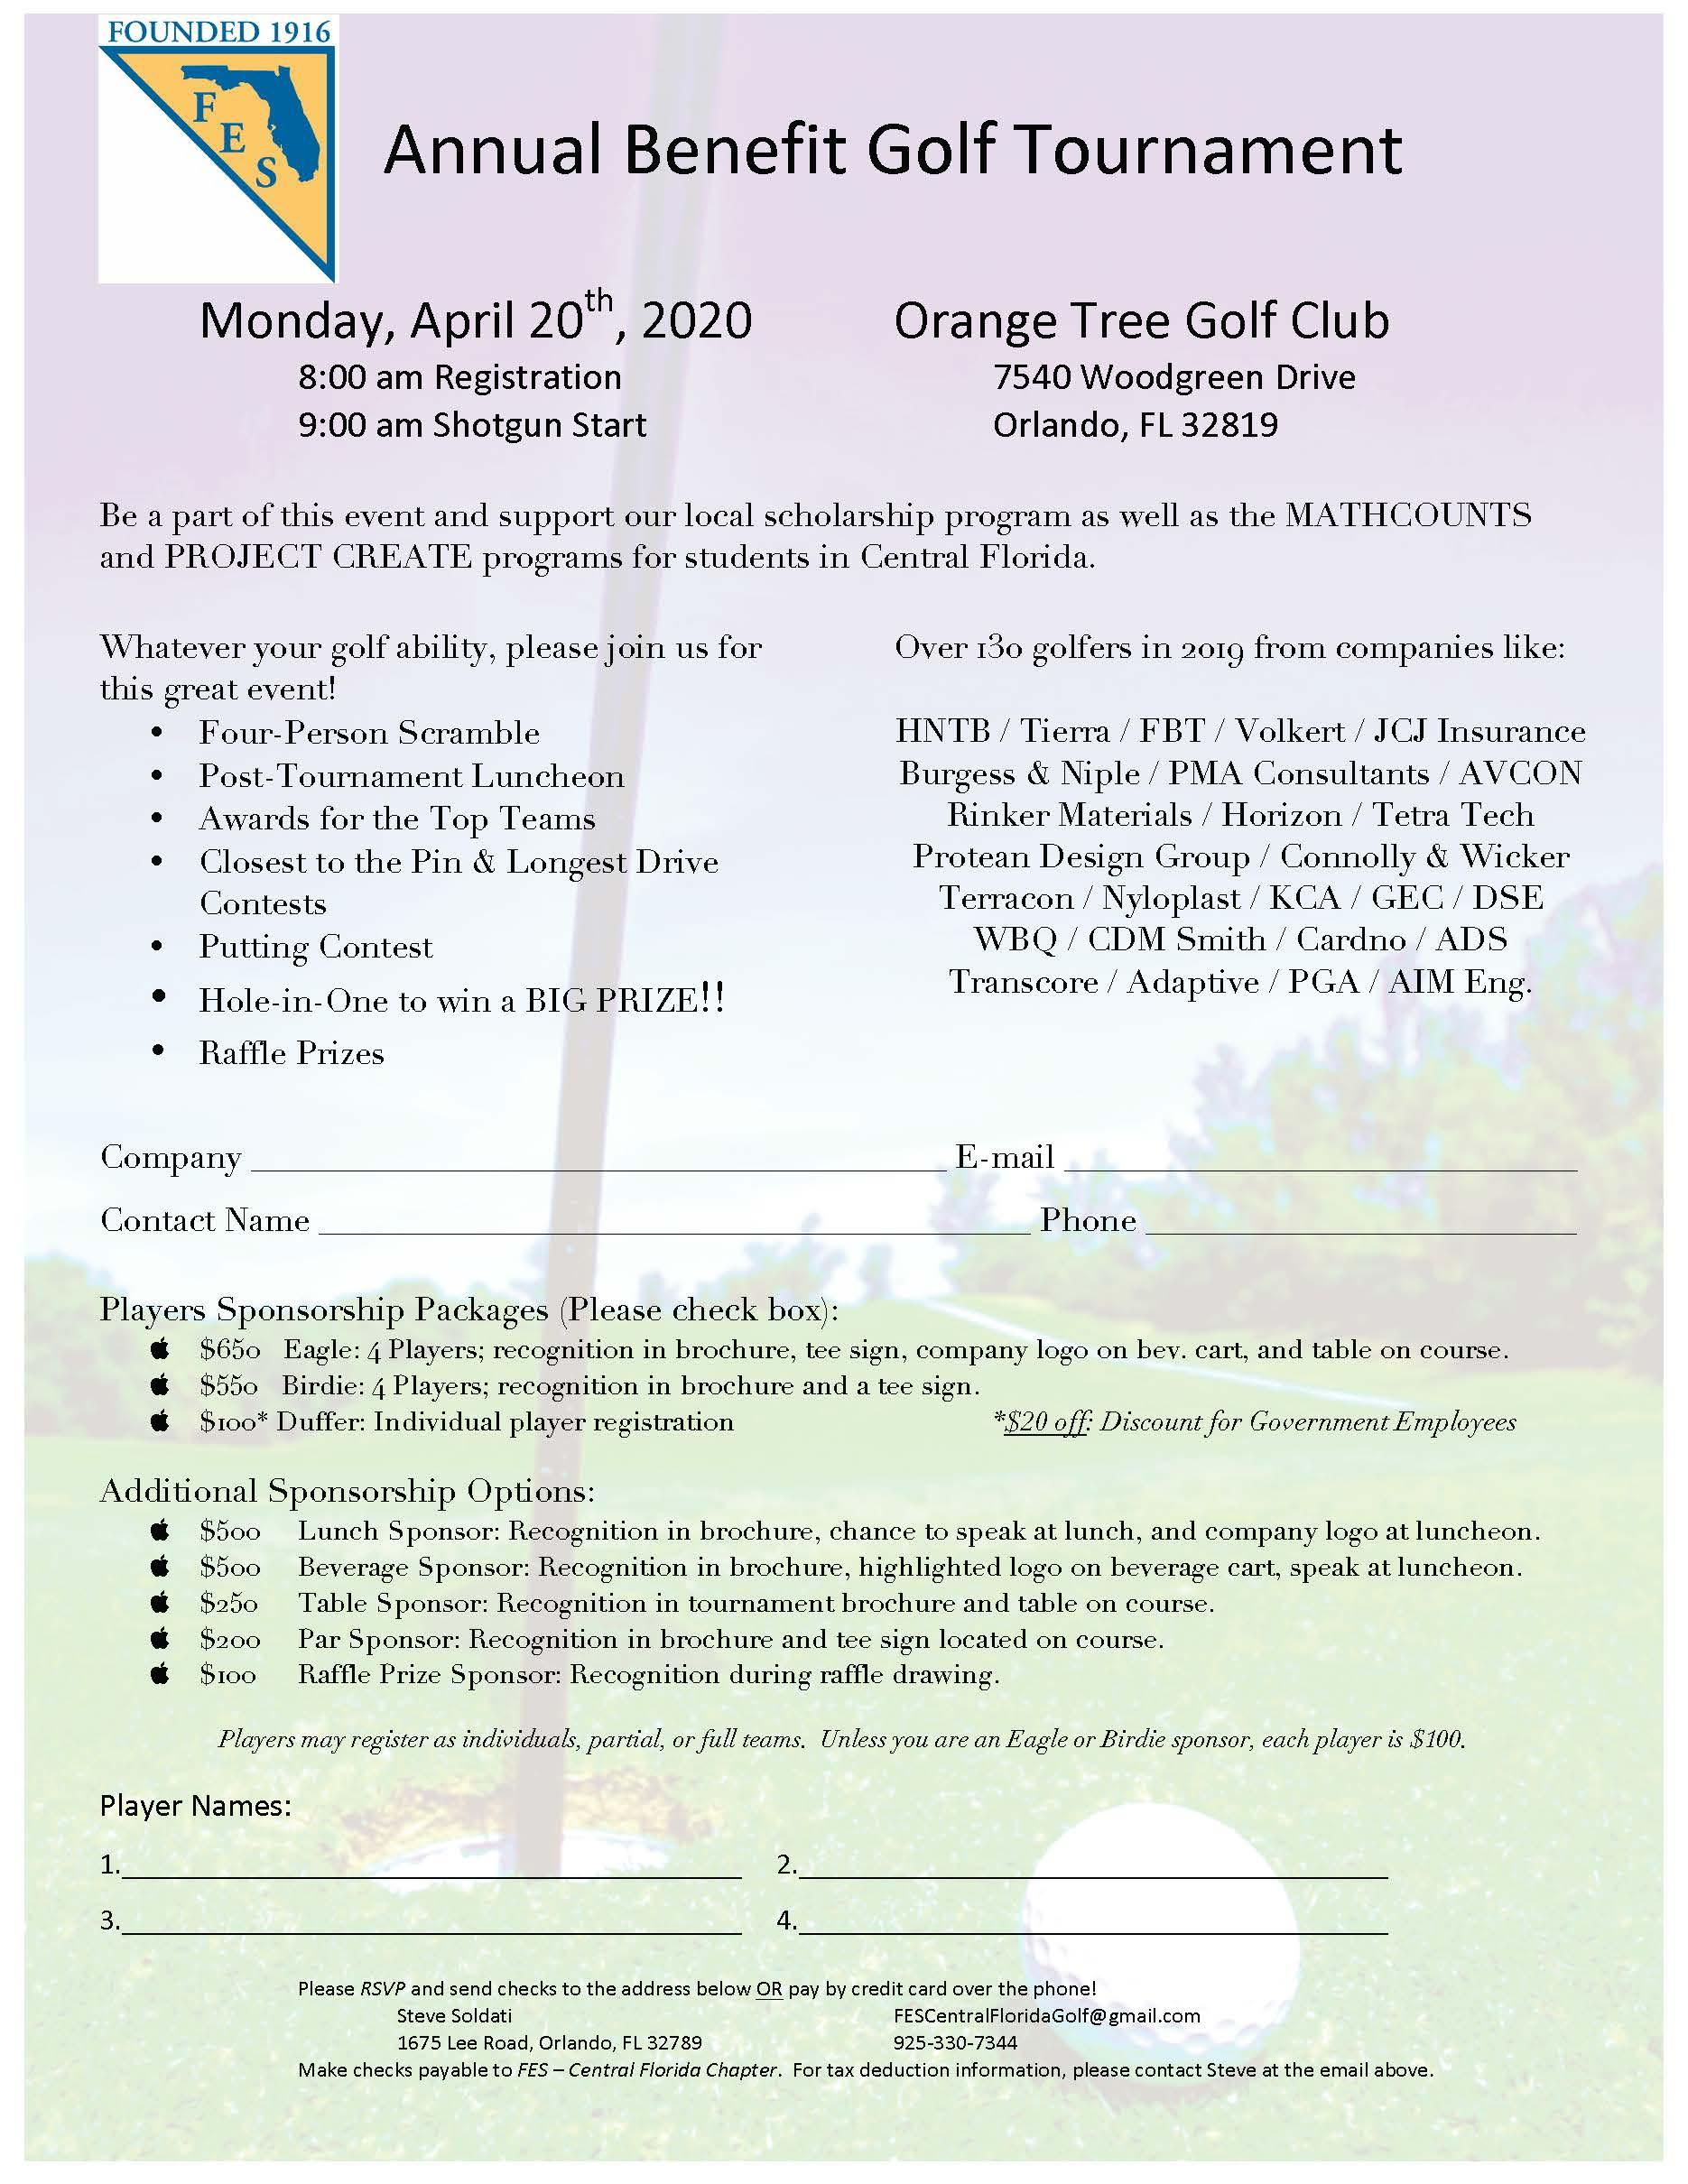 REGISTRATION OPEN!! 2020 FES Annual Golf Tournament- April 20th